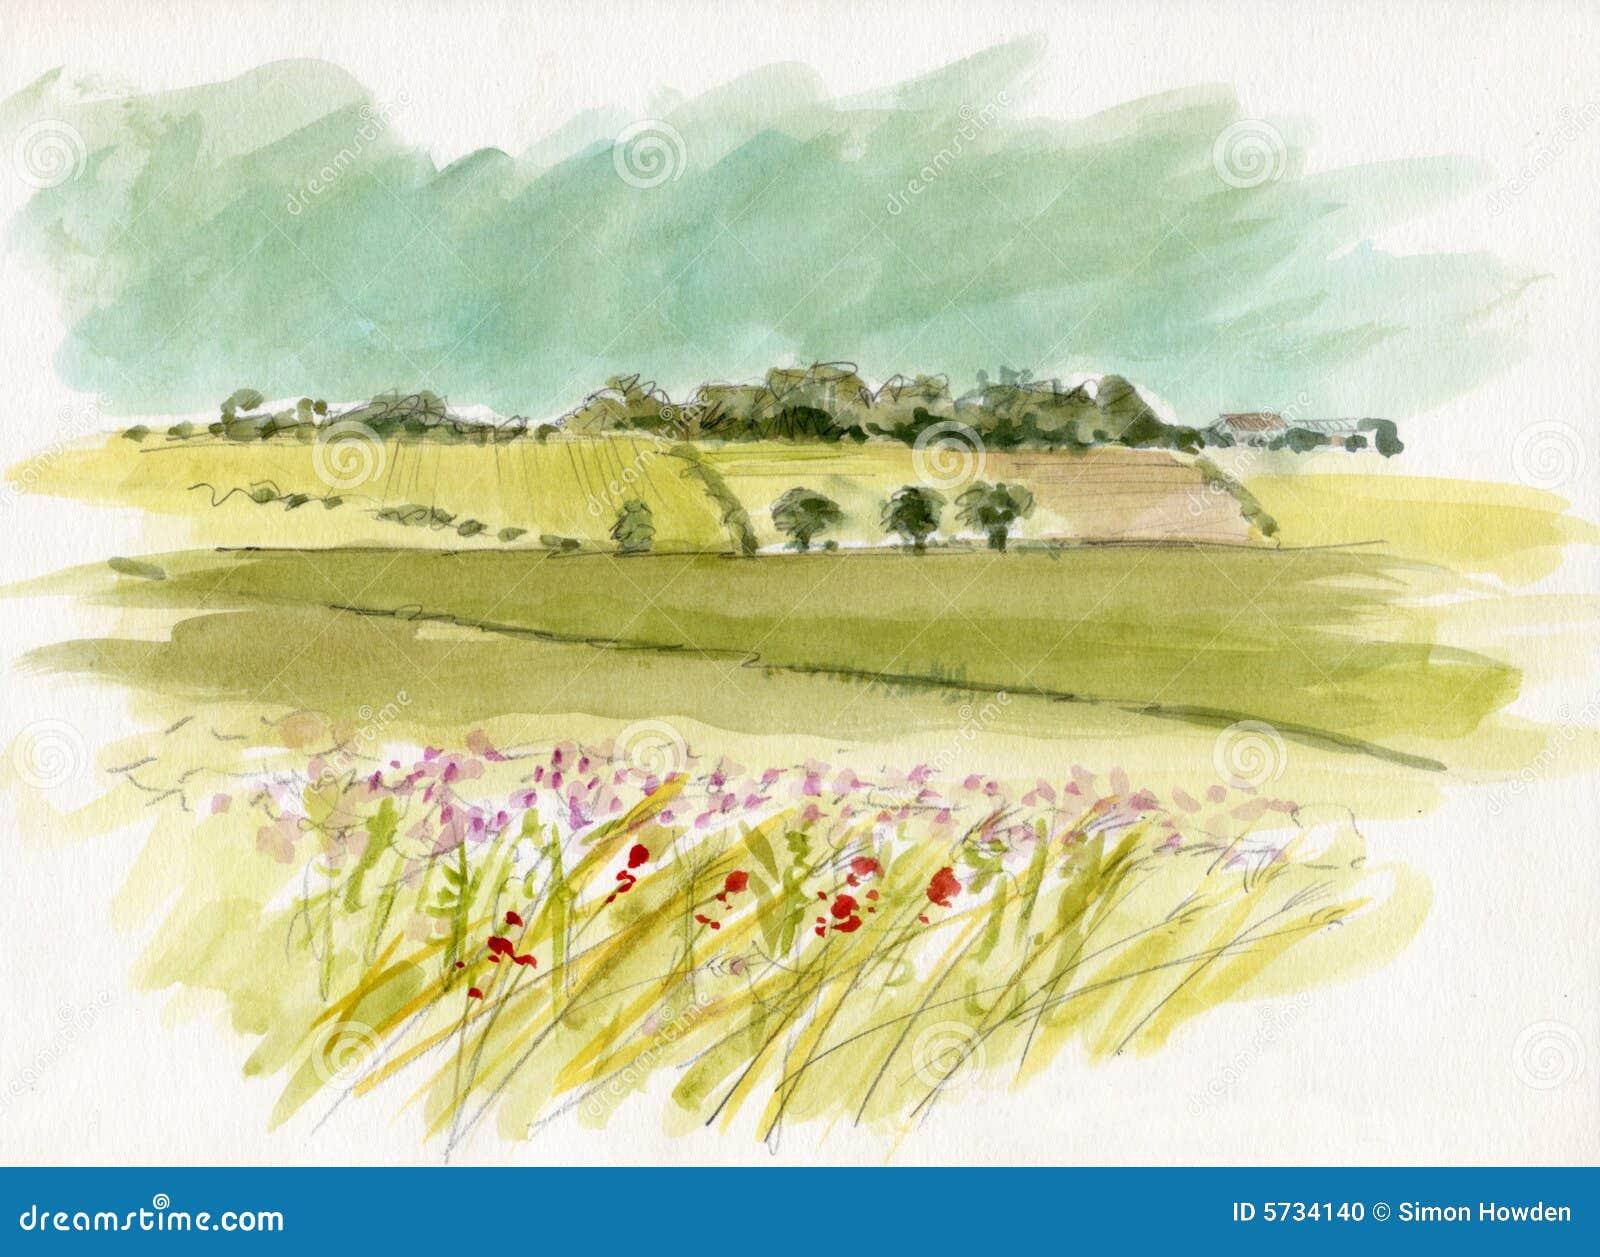 Landscape Illustration Vector Free: Watercolour Landscape Sketch Stock Photo